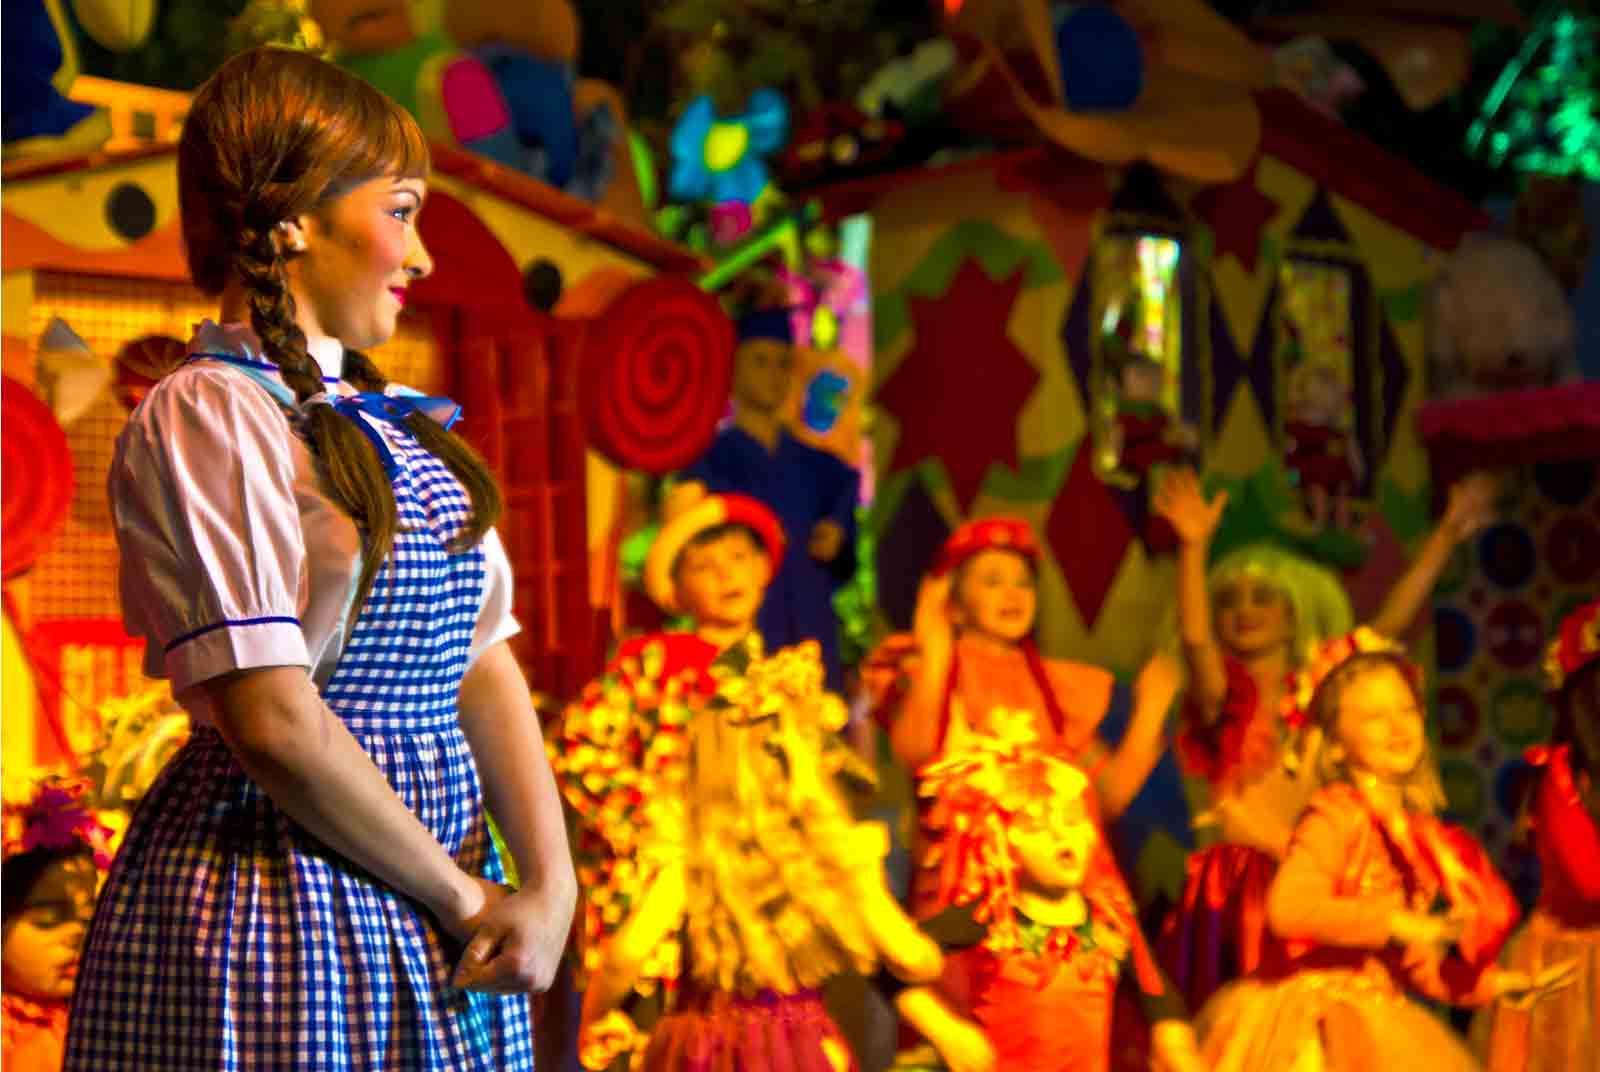 School excursions bringing fairytales andstories alive